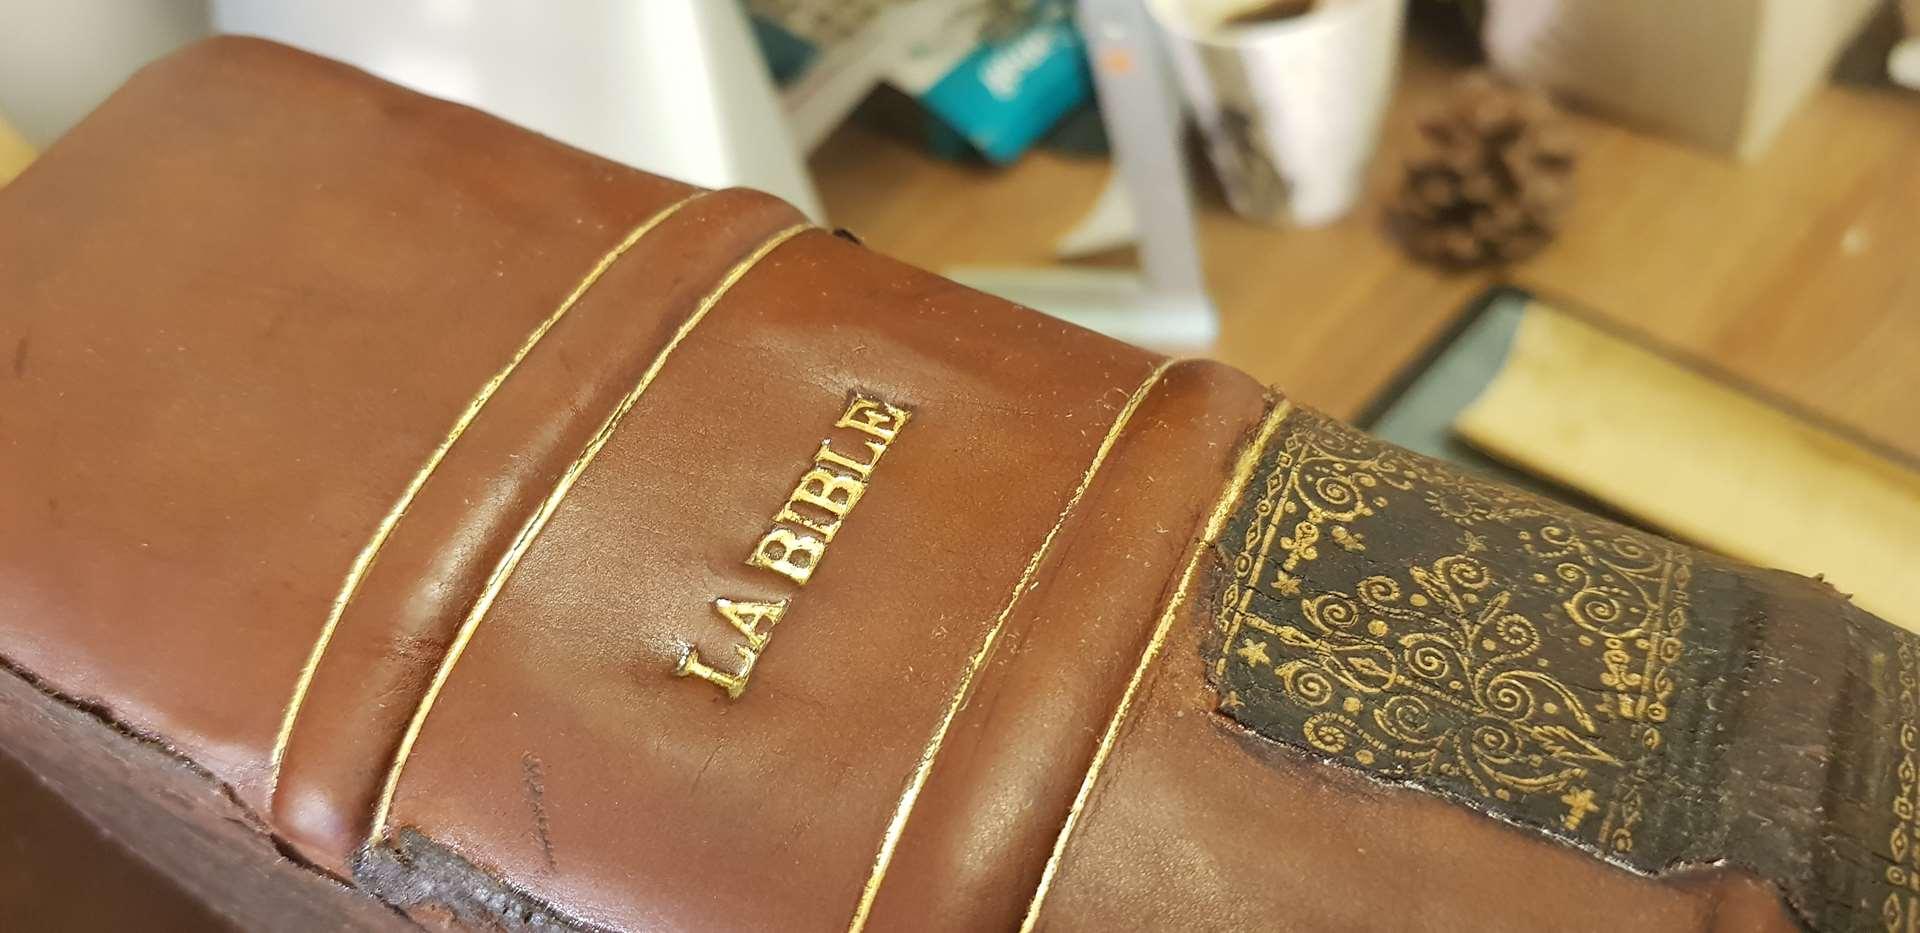 dorure bible